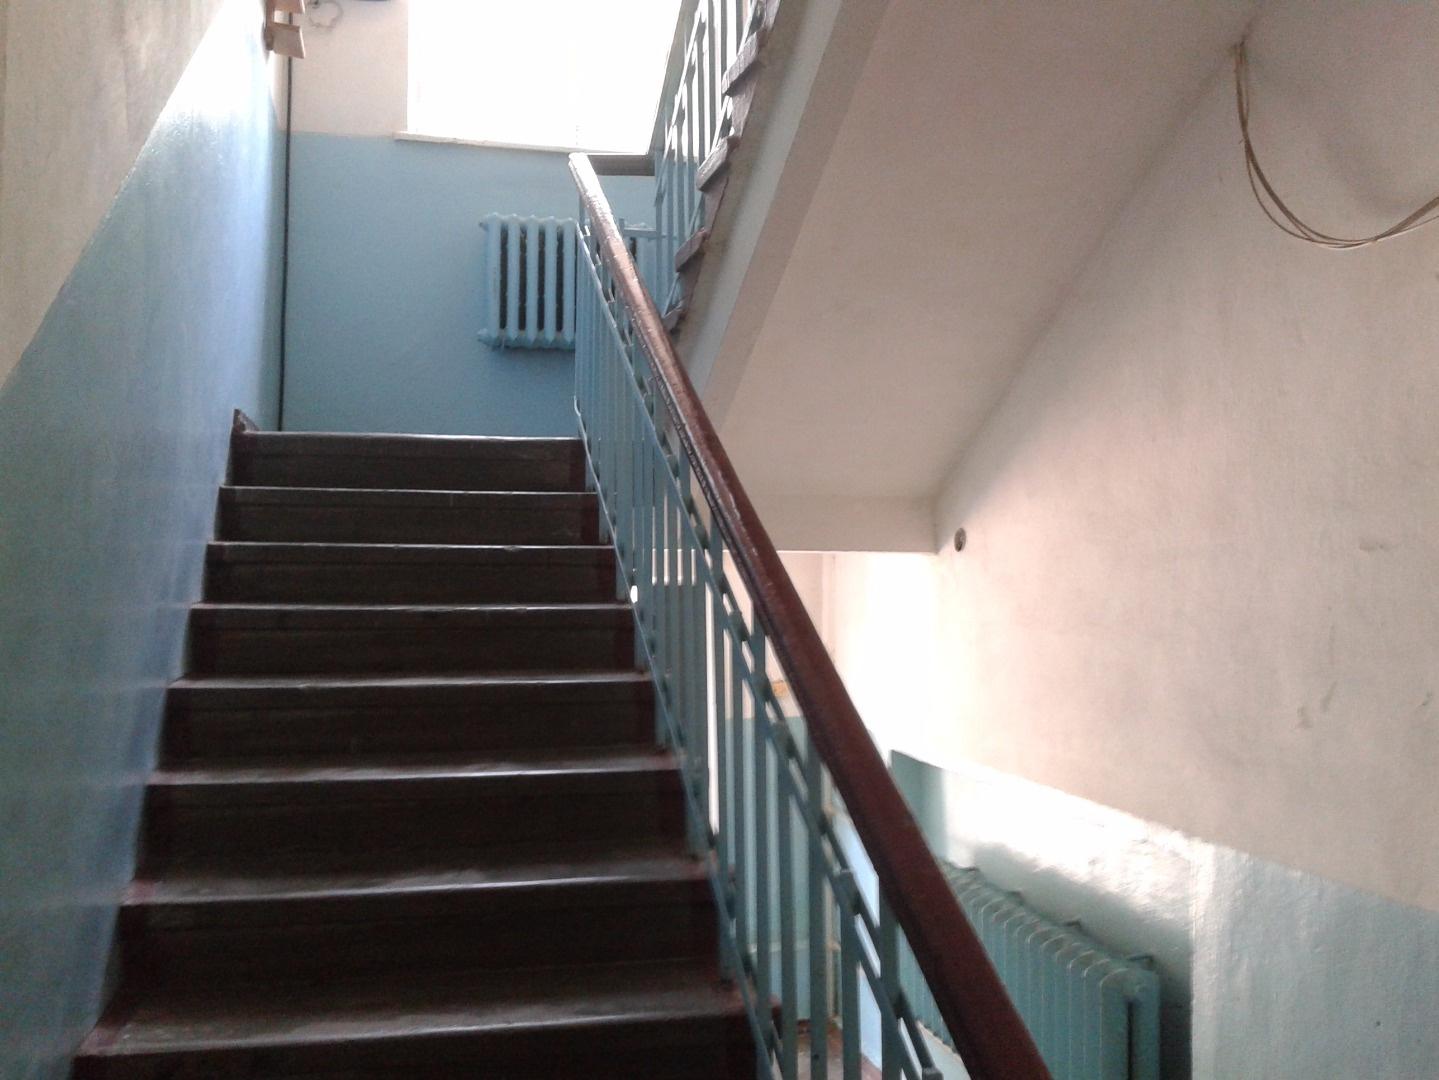 Продается 3-комнатная квартира на ул. Семинарская (Гамарника) — 80 000 у.е. (фото №4)